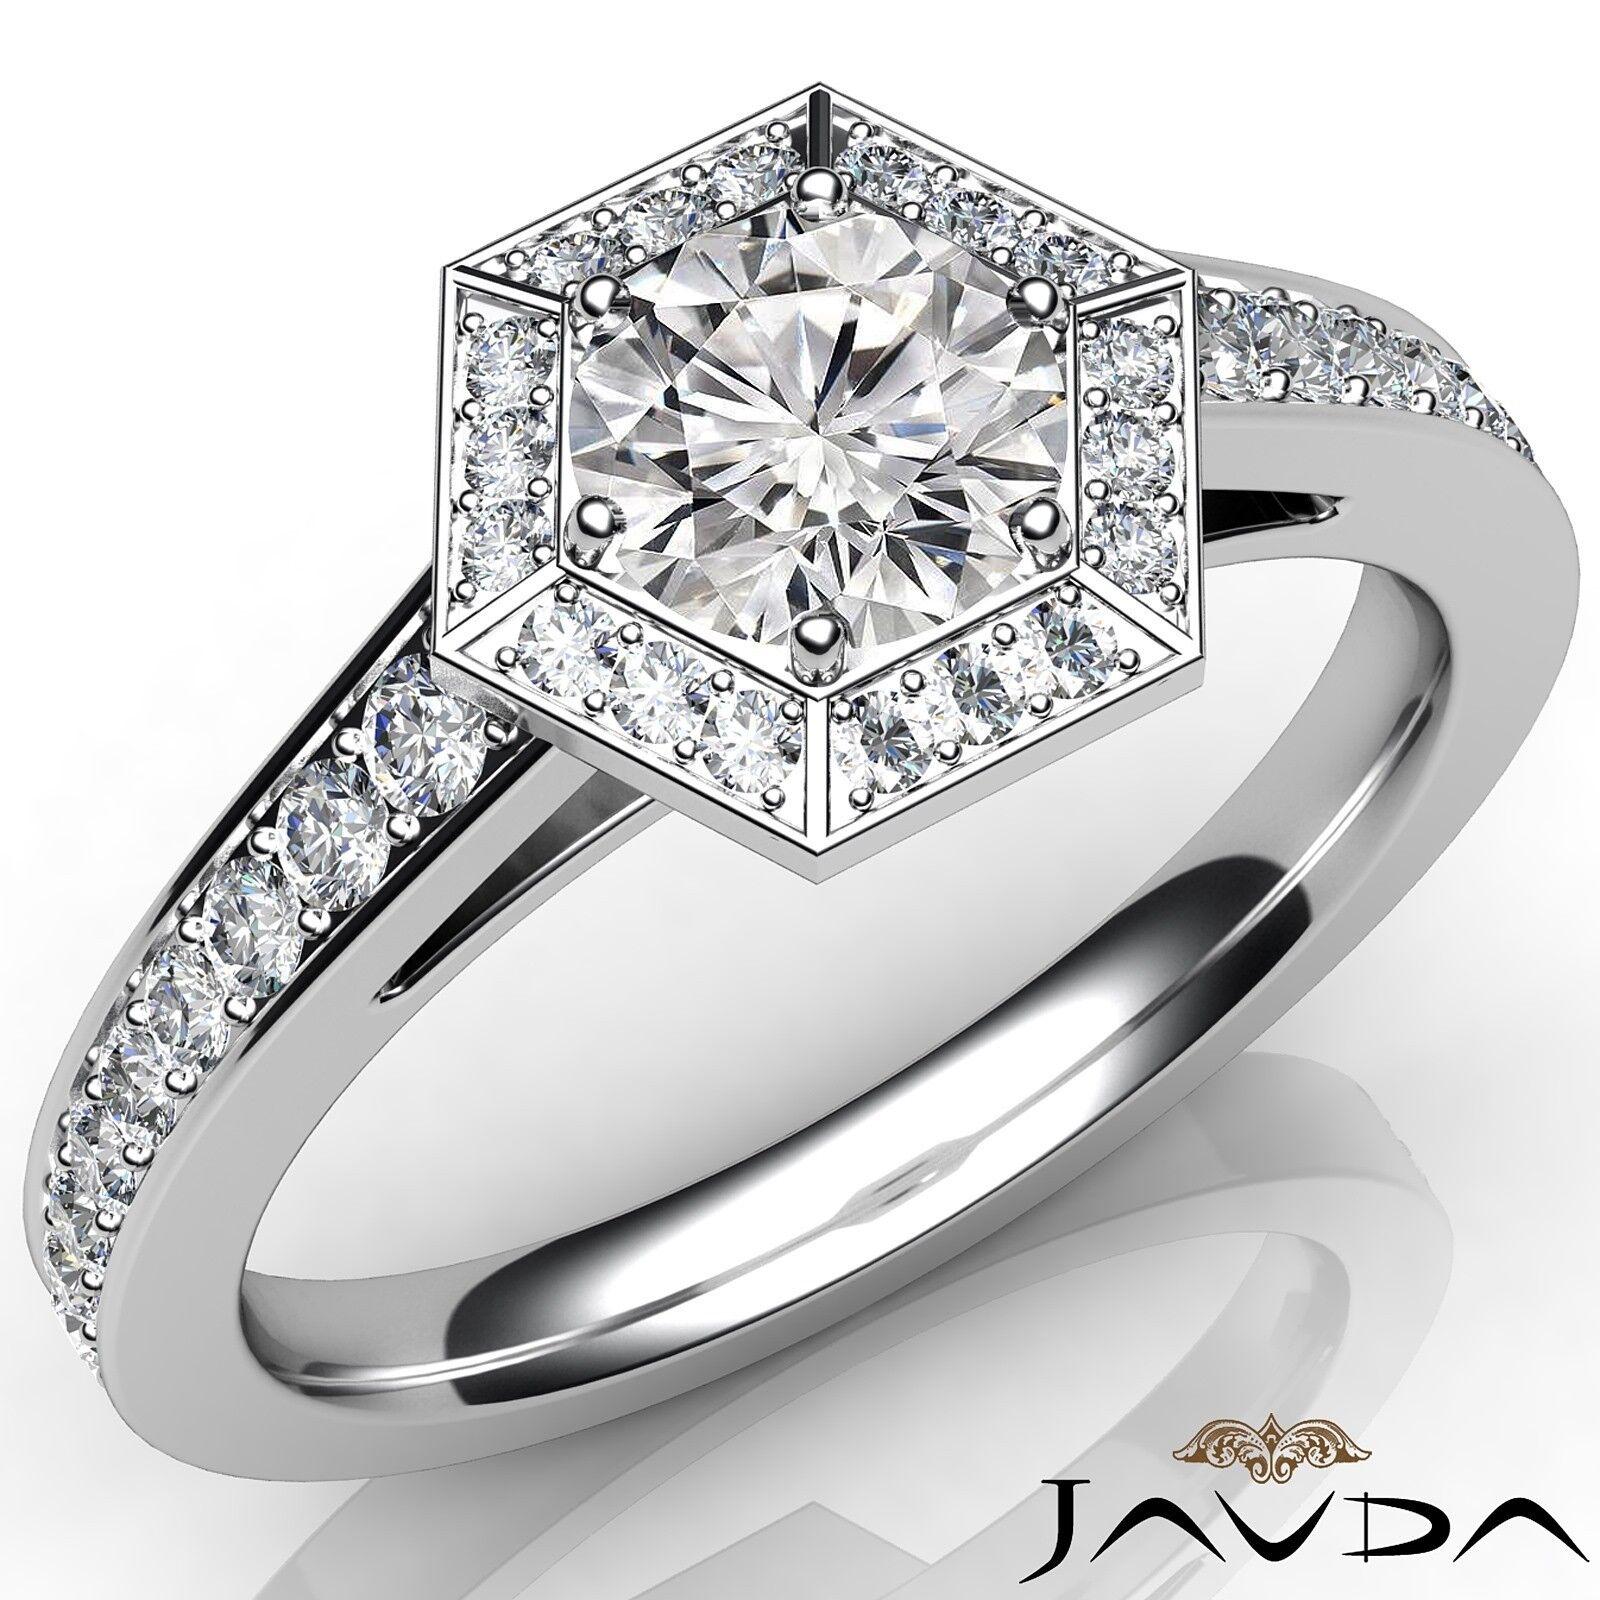 0.96ctw Certified Stone Round Diamond Engagement Ring GIA F-VVS2 White Gold New